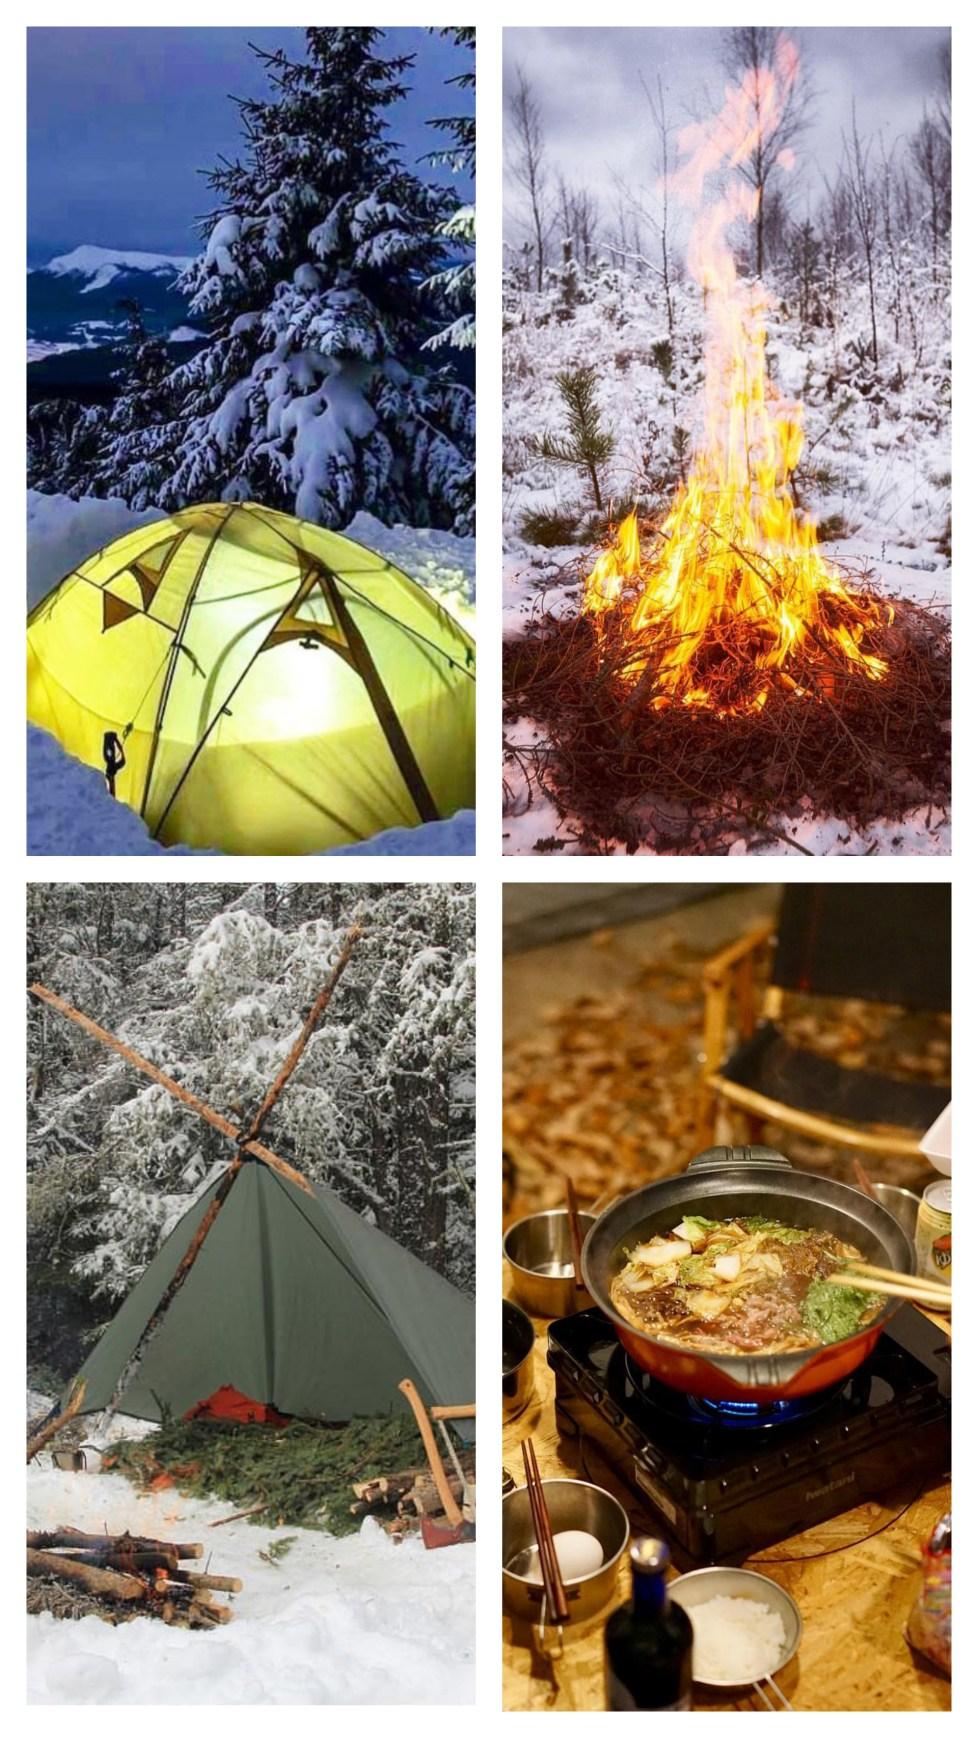 camping winter